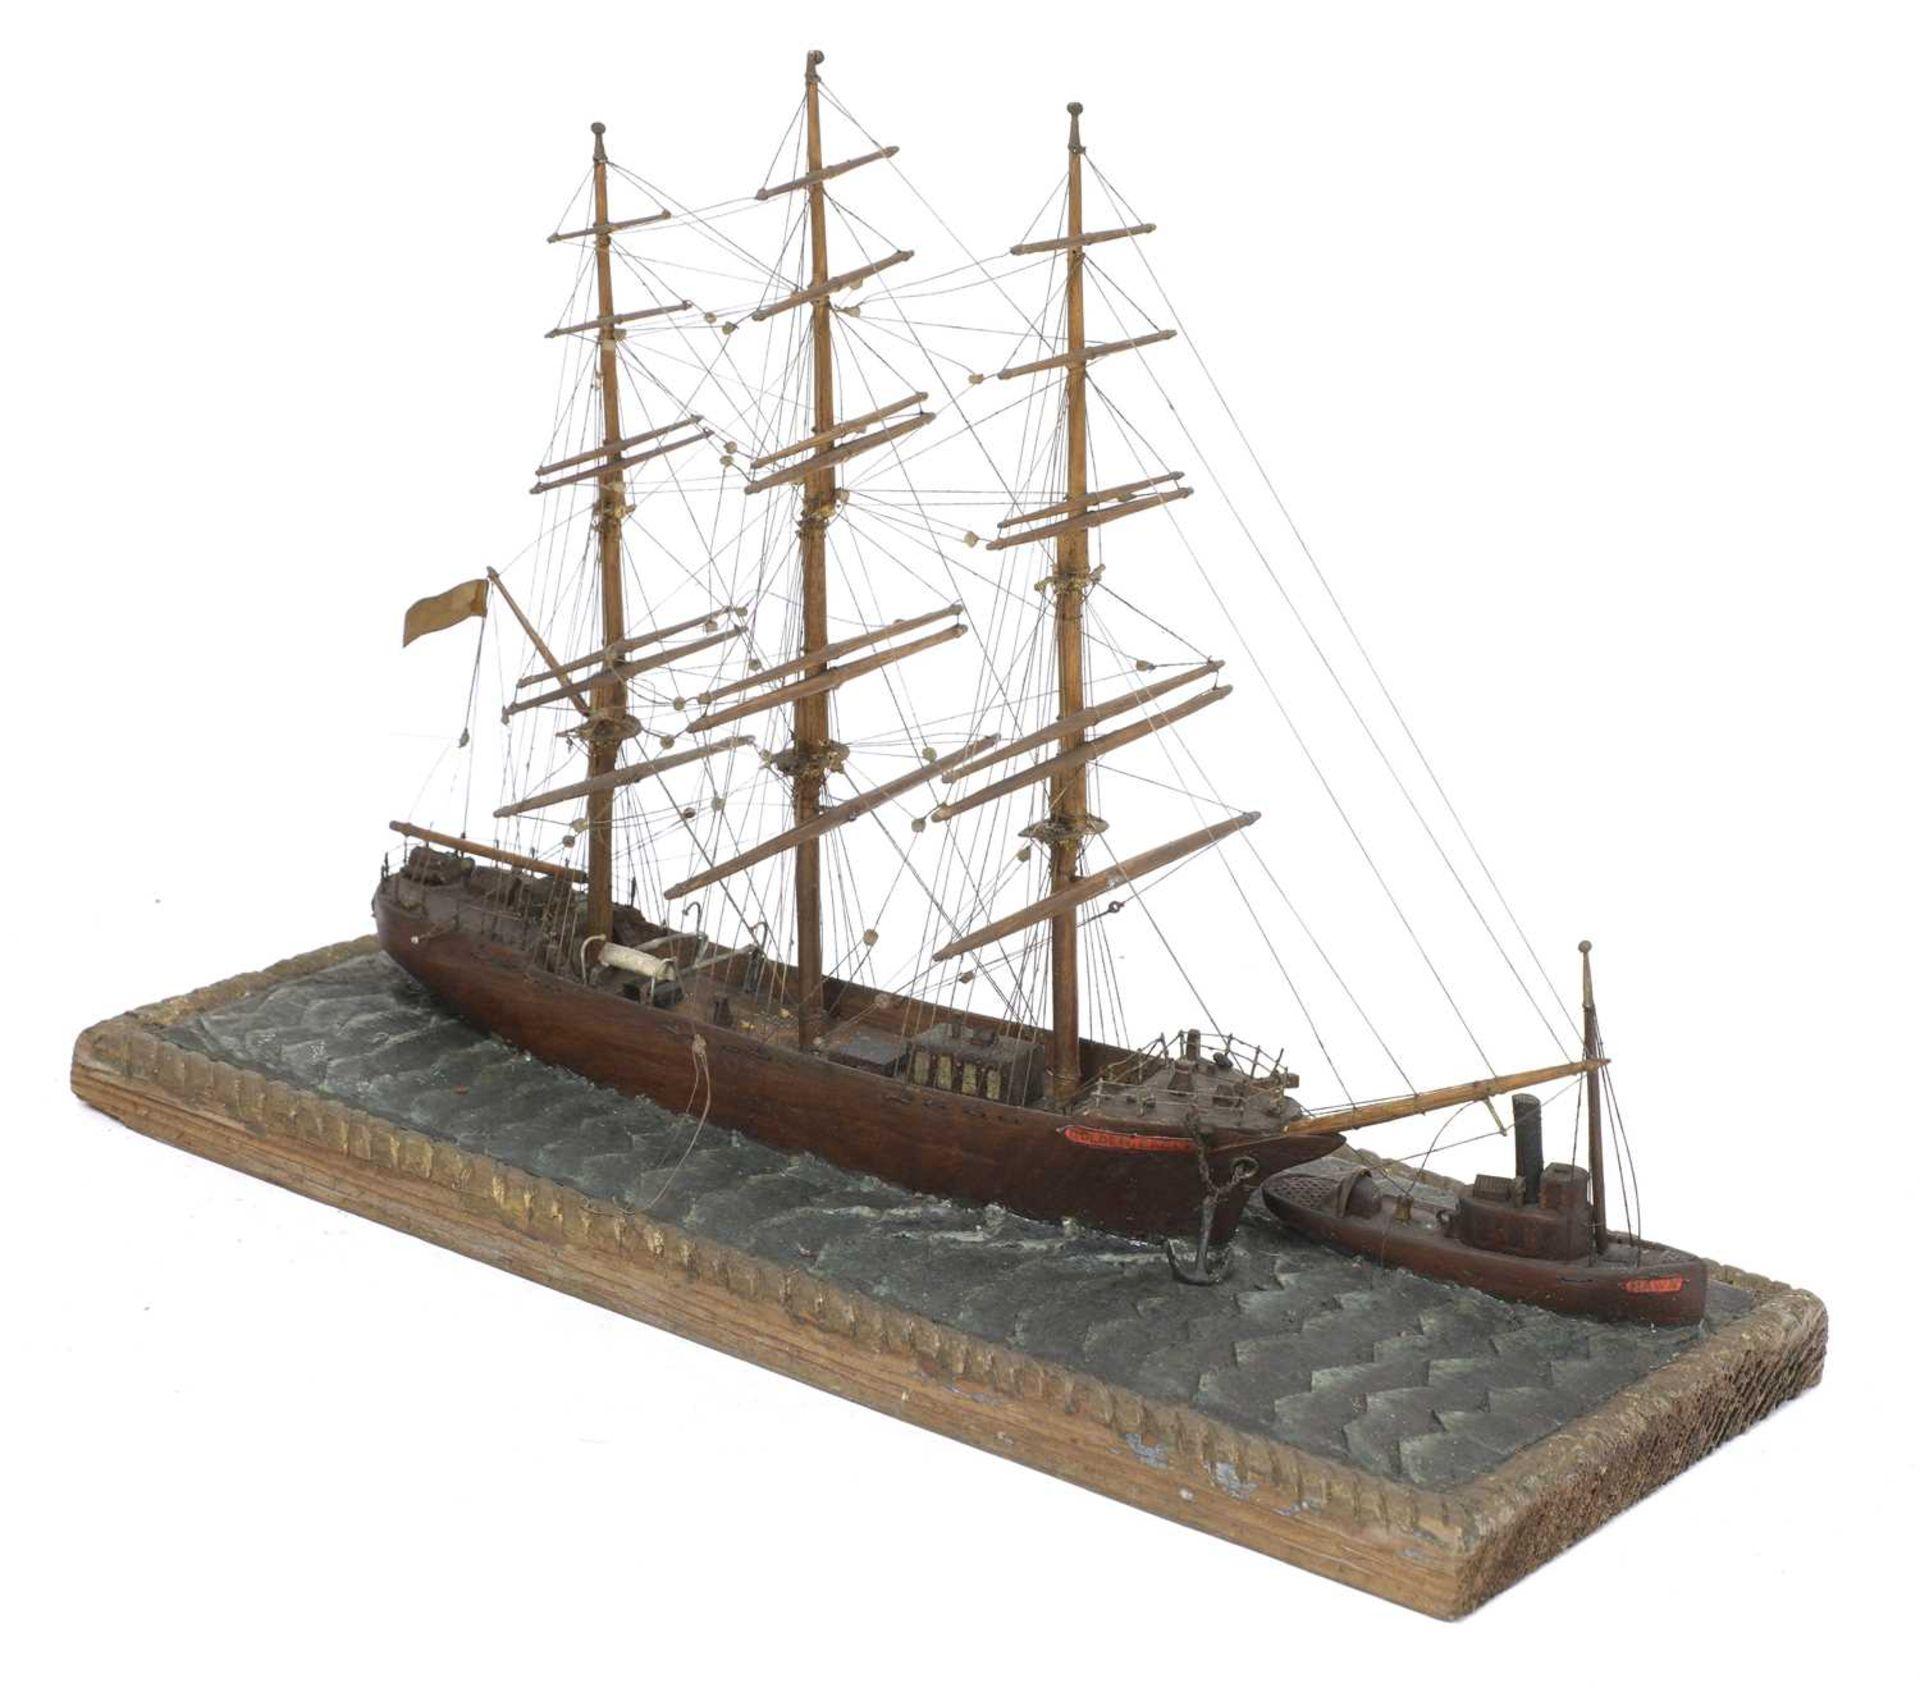 A North American scratch built, folk art, ship model, - Image 2 of 6